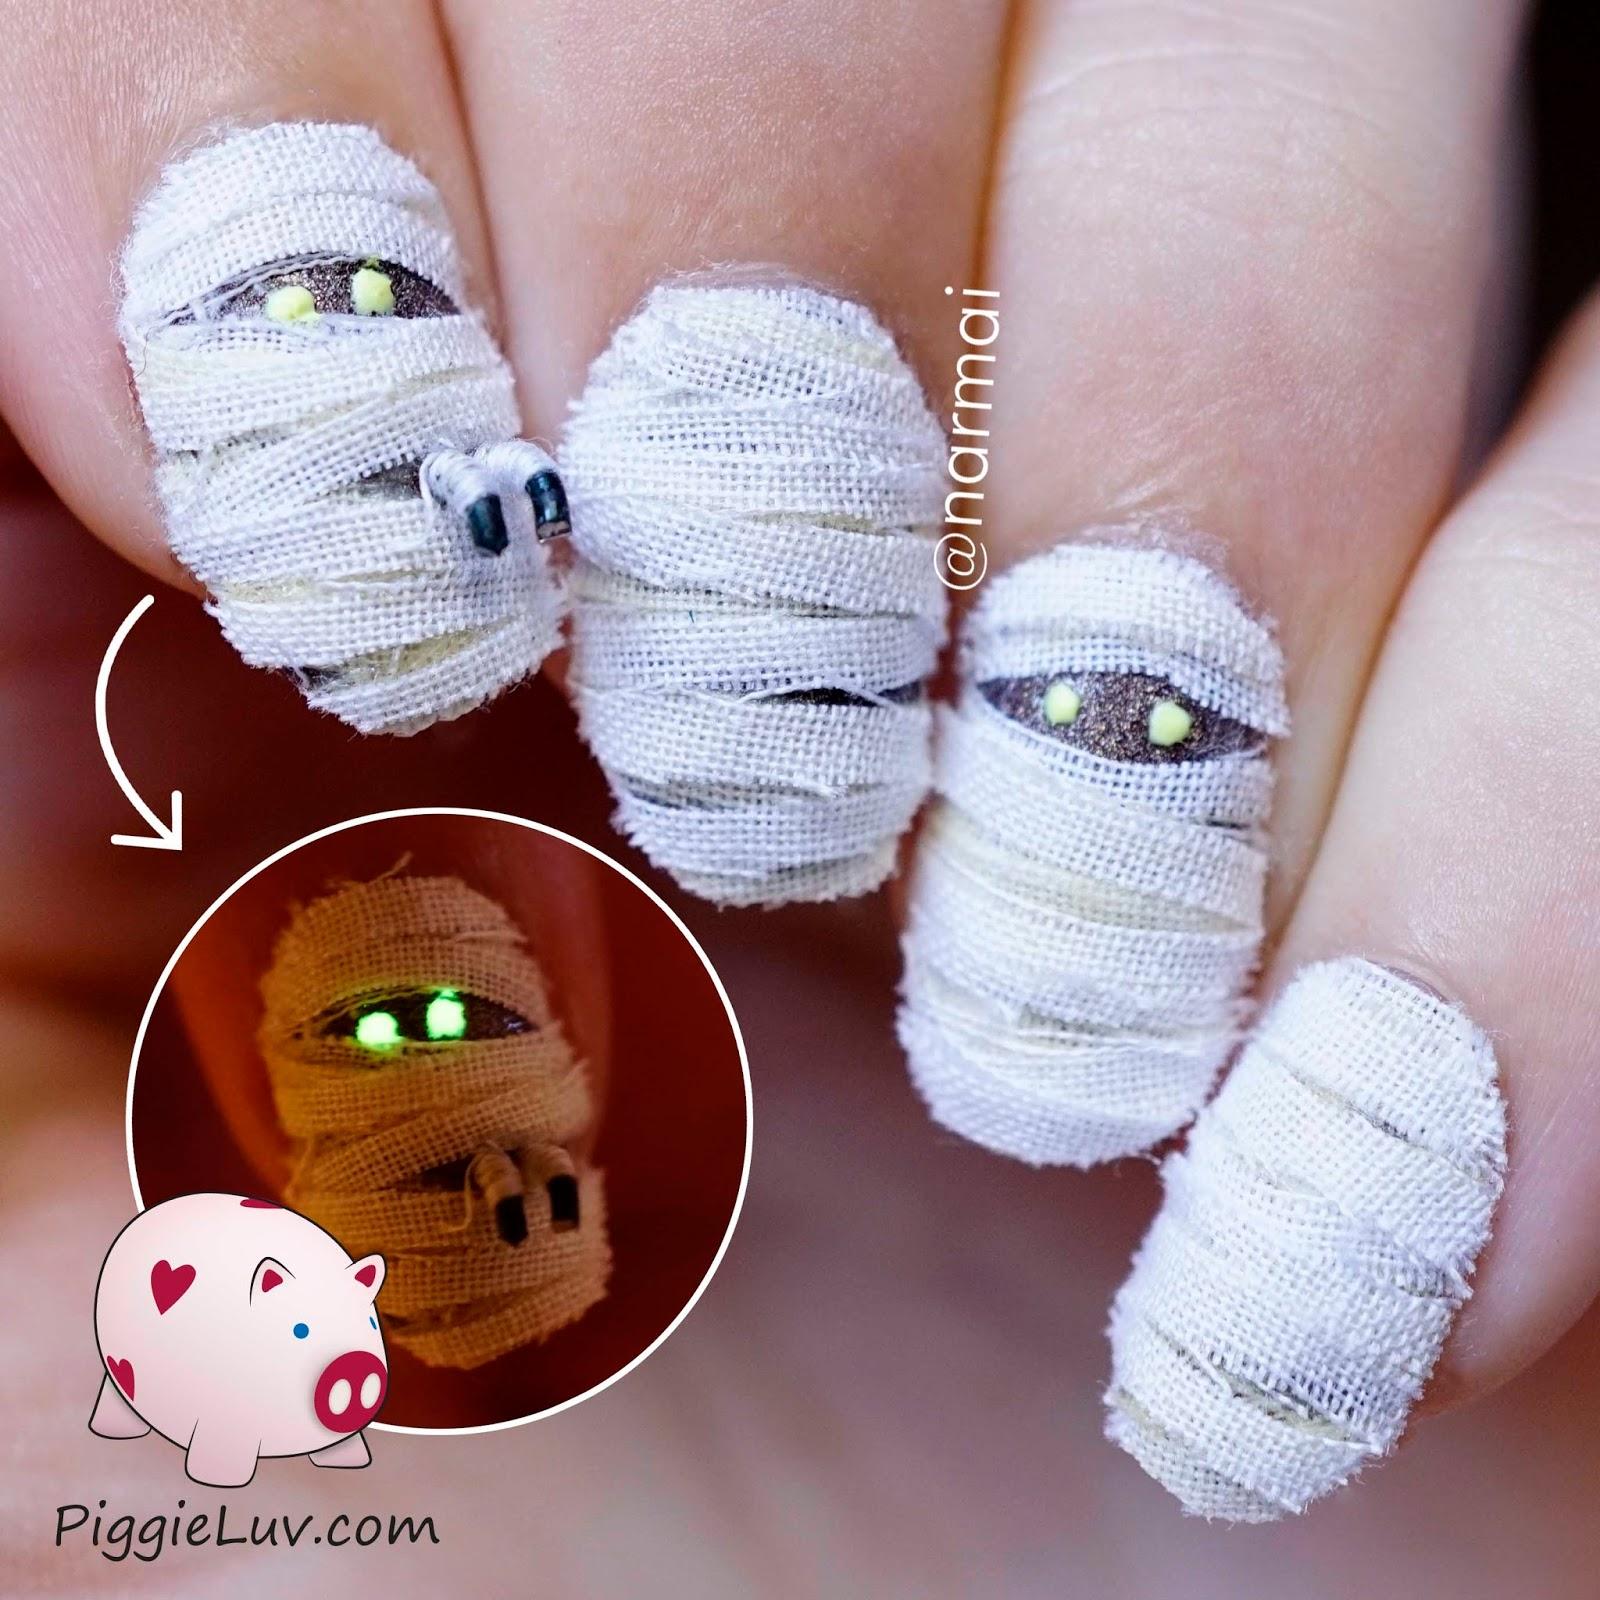 PiggieLuv: My favorite nail art designs of 2015!